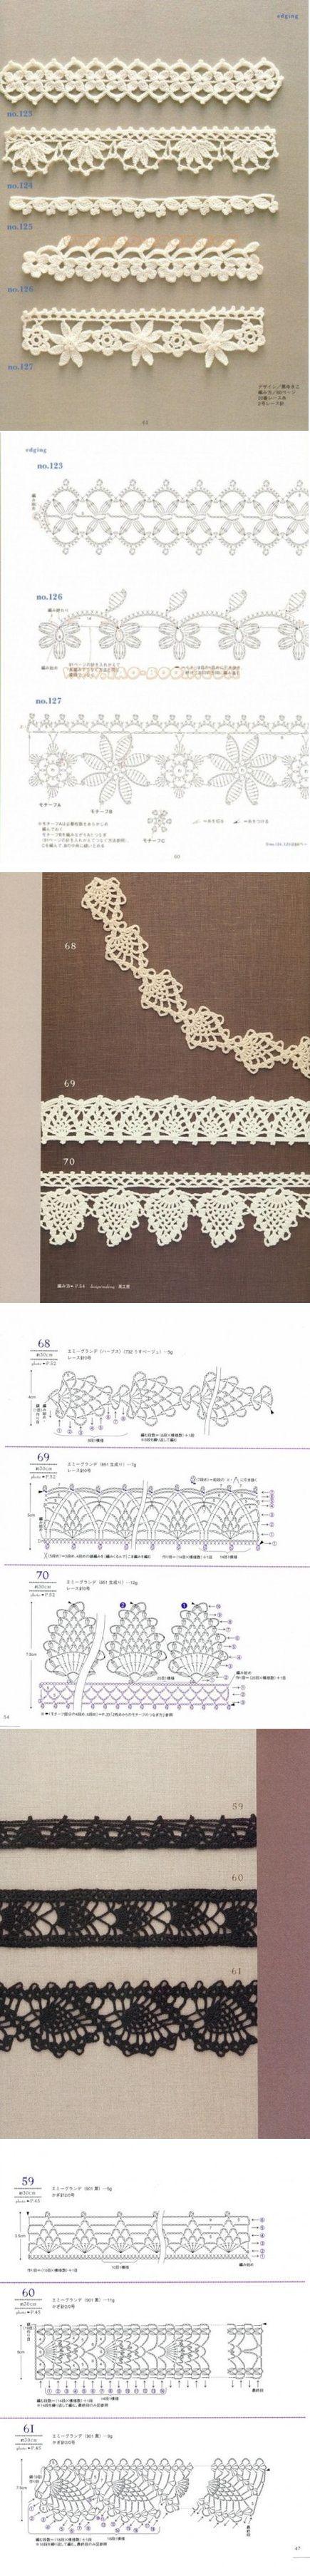 such delicate crochet edgings!: